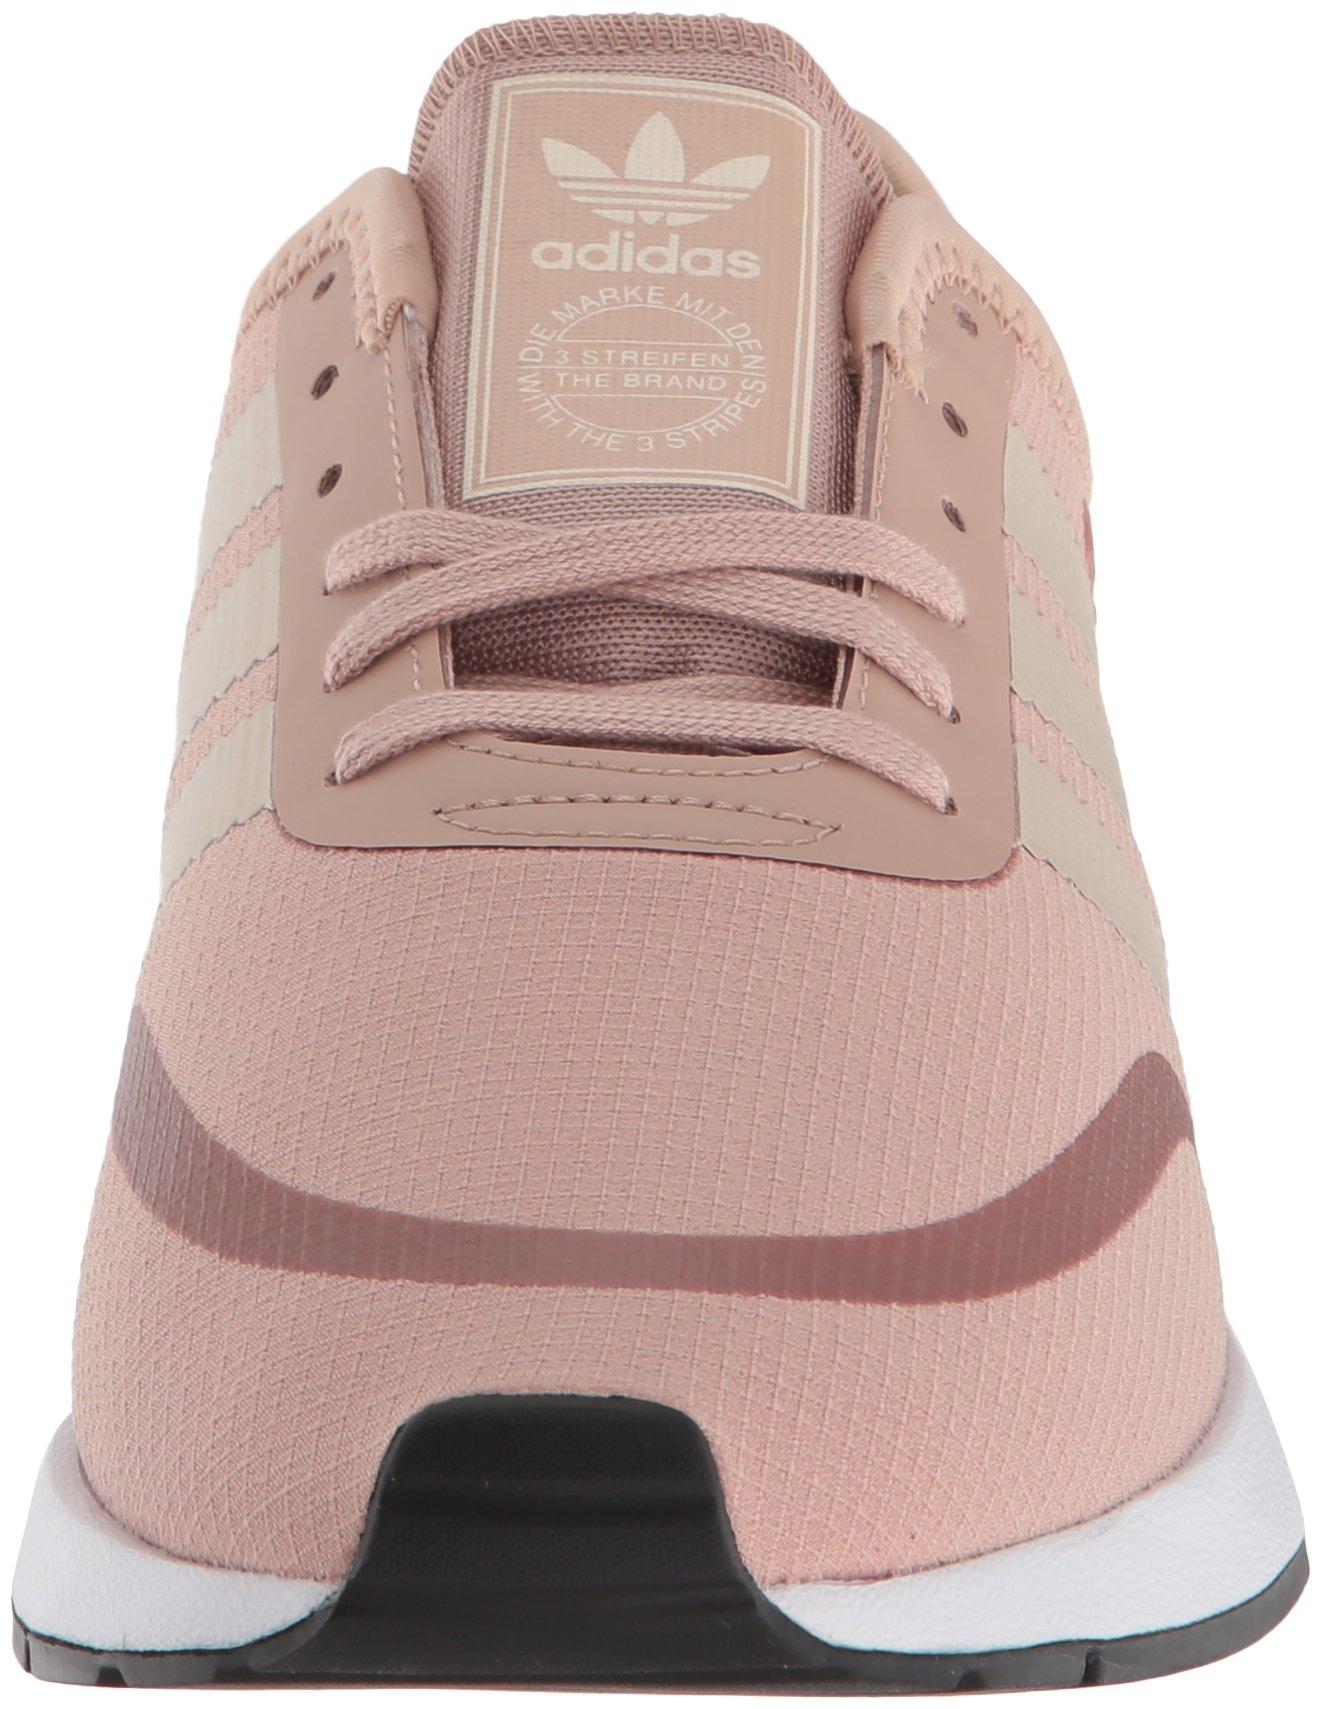 adidas Originals Women's Iniki Runner CLS W, Ash Pearl/Linen/White, 5 M US by adidas Originals (Image #4)